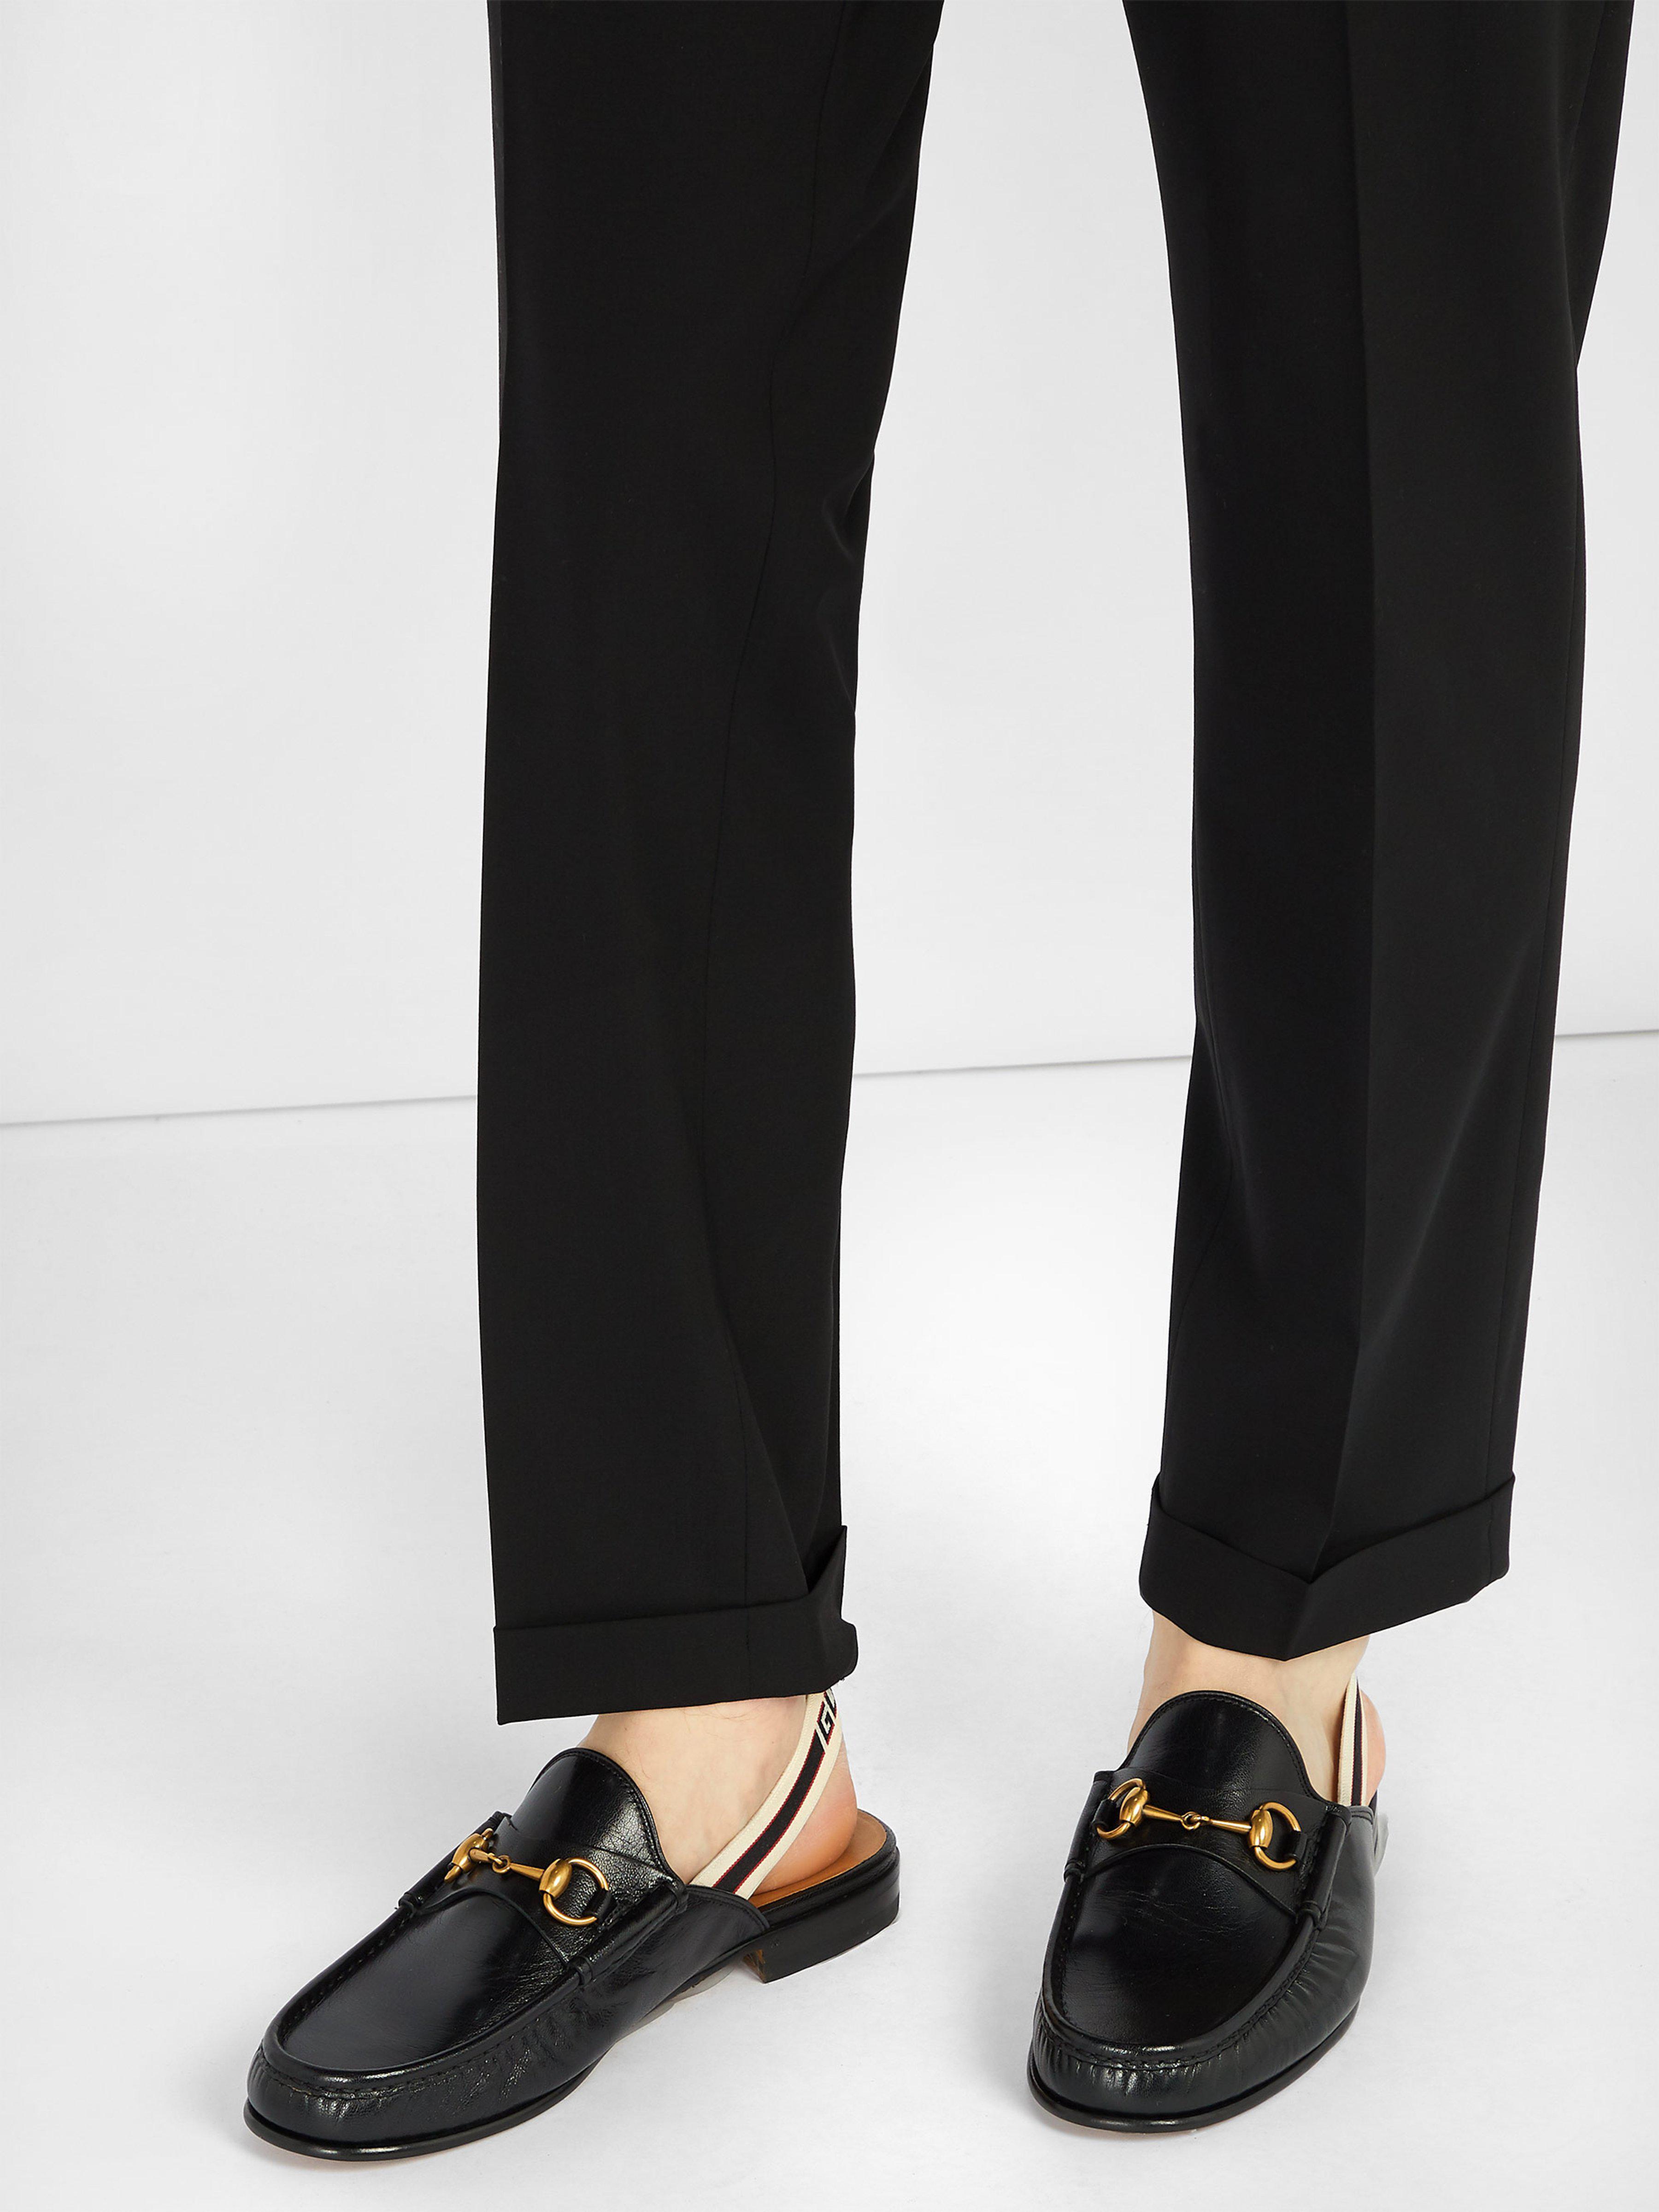 357757c6f95 Gucci - Black Horsebit Slingback Strap Backless Leather Loafers for Men -  Lyst. View fullscreen